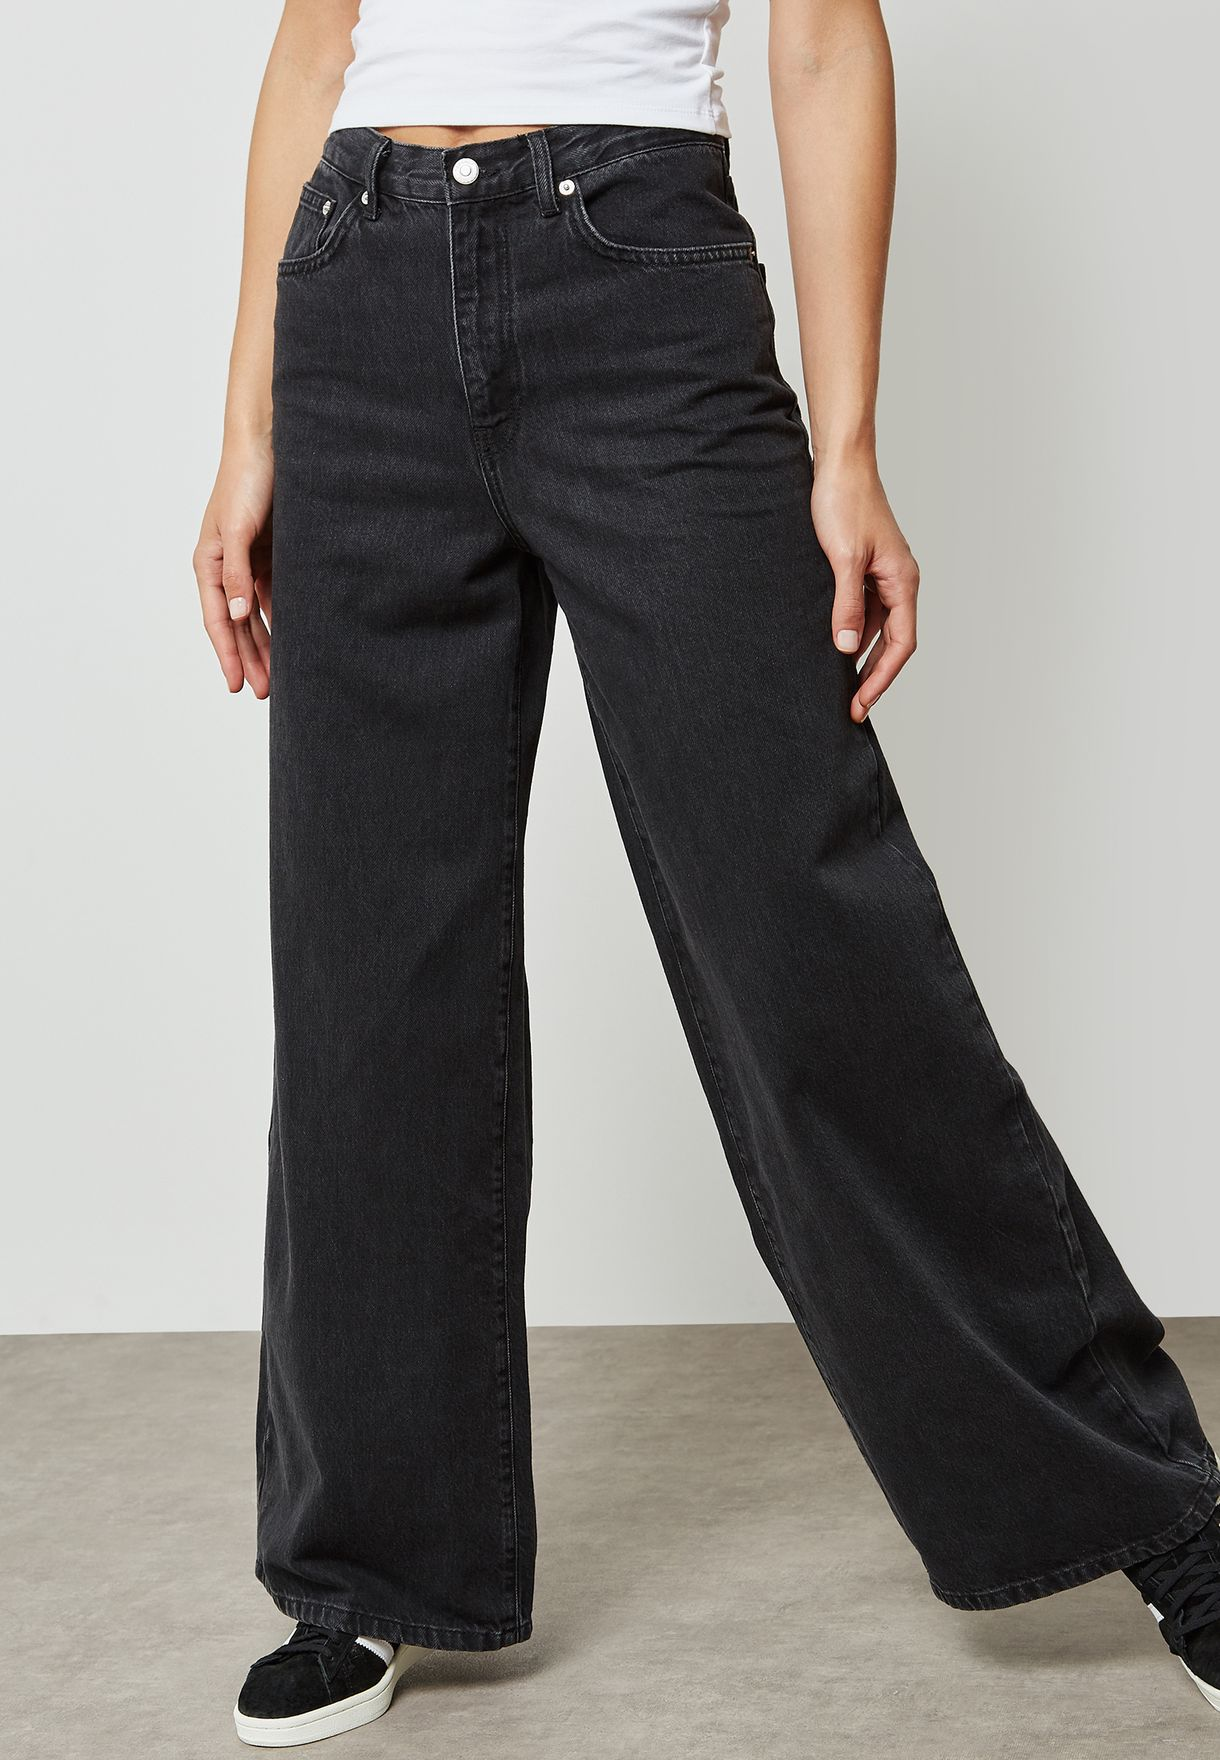 3618ae946fd Shop Topshop black MOTO Wide Leg High Rise Jeans 02C07NWBK ...